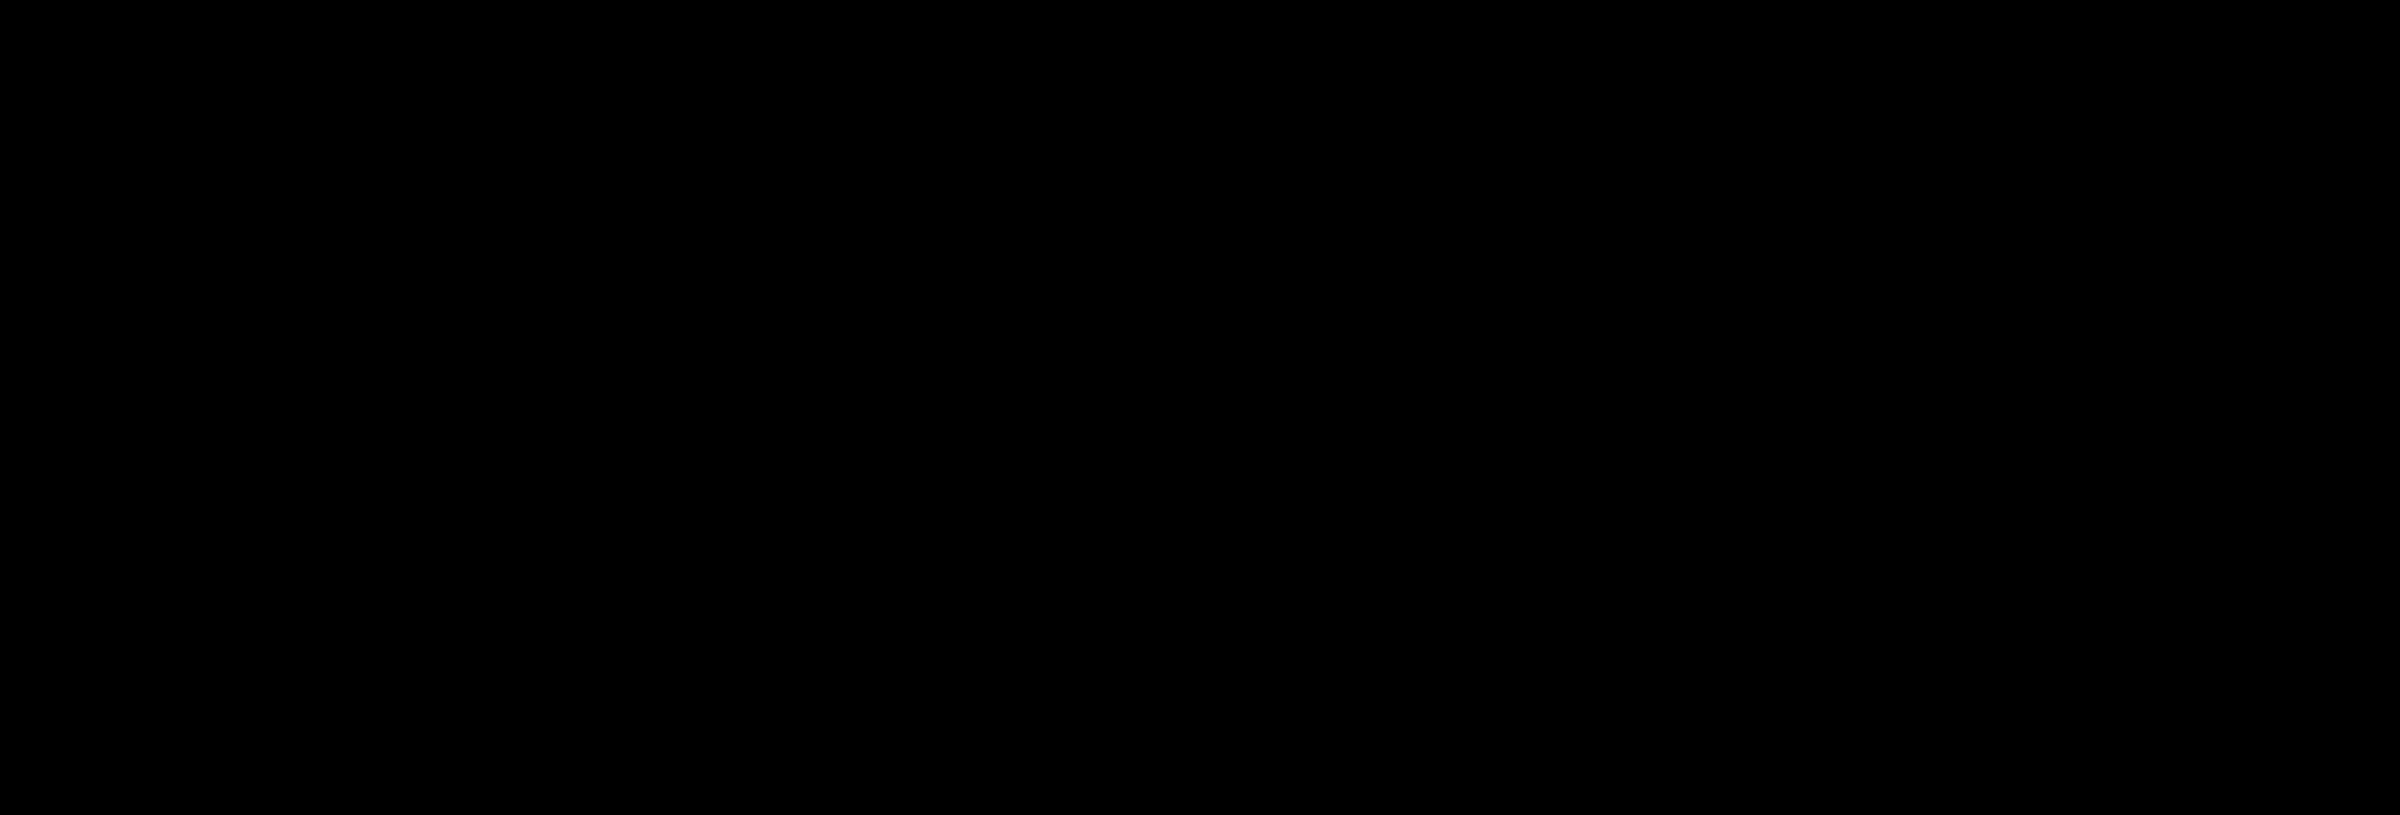 2400x815 Clipart